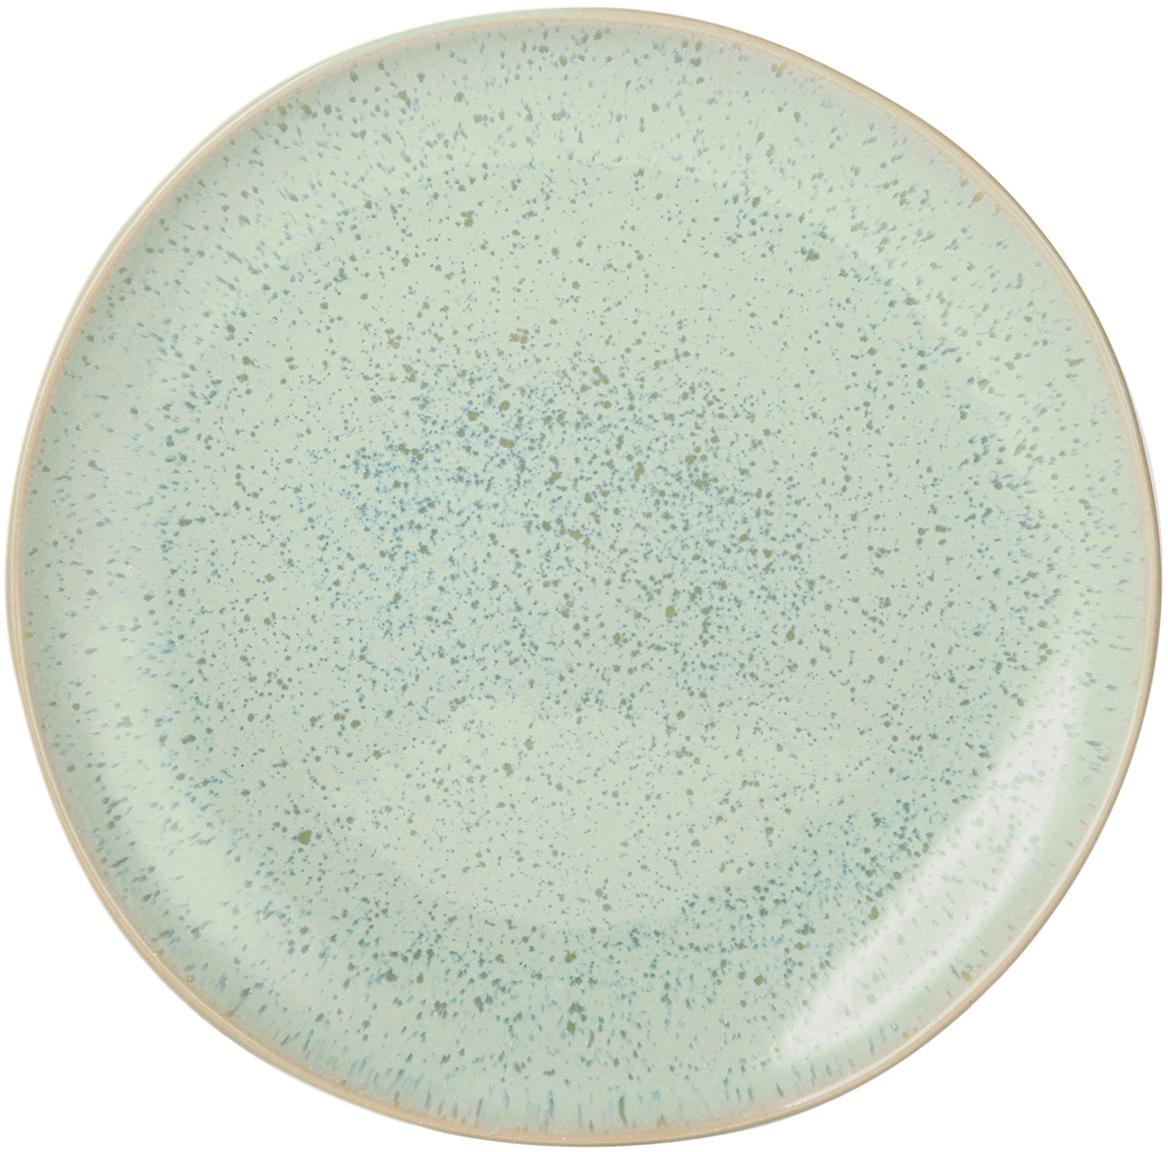 Platos postre artesanales Areia, 2uds., Gres, Menta, blanco crudo, beige, Ø 22 cm